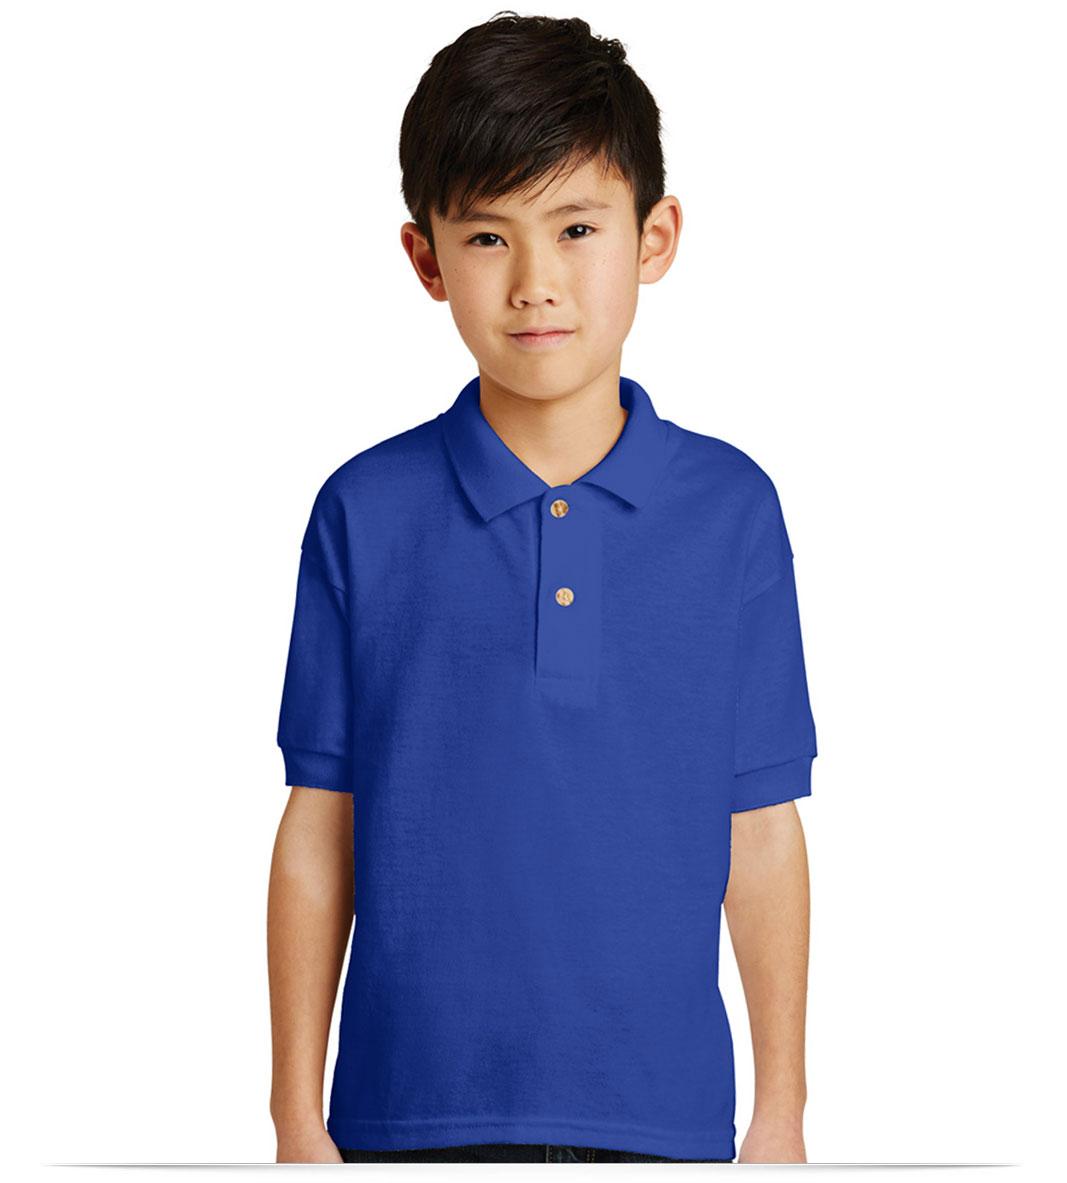 Customize Gildan Youth Jersey Knit Sport Shirt